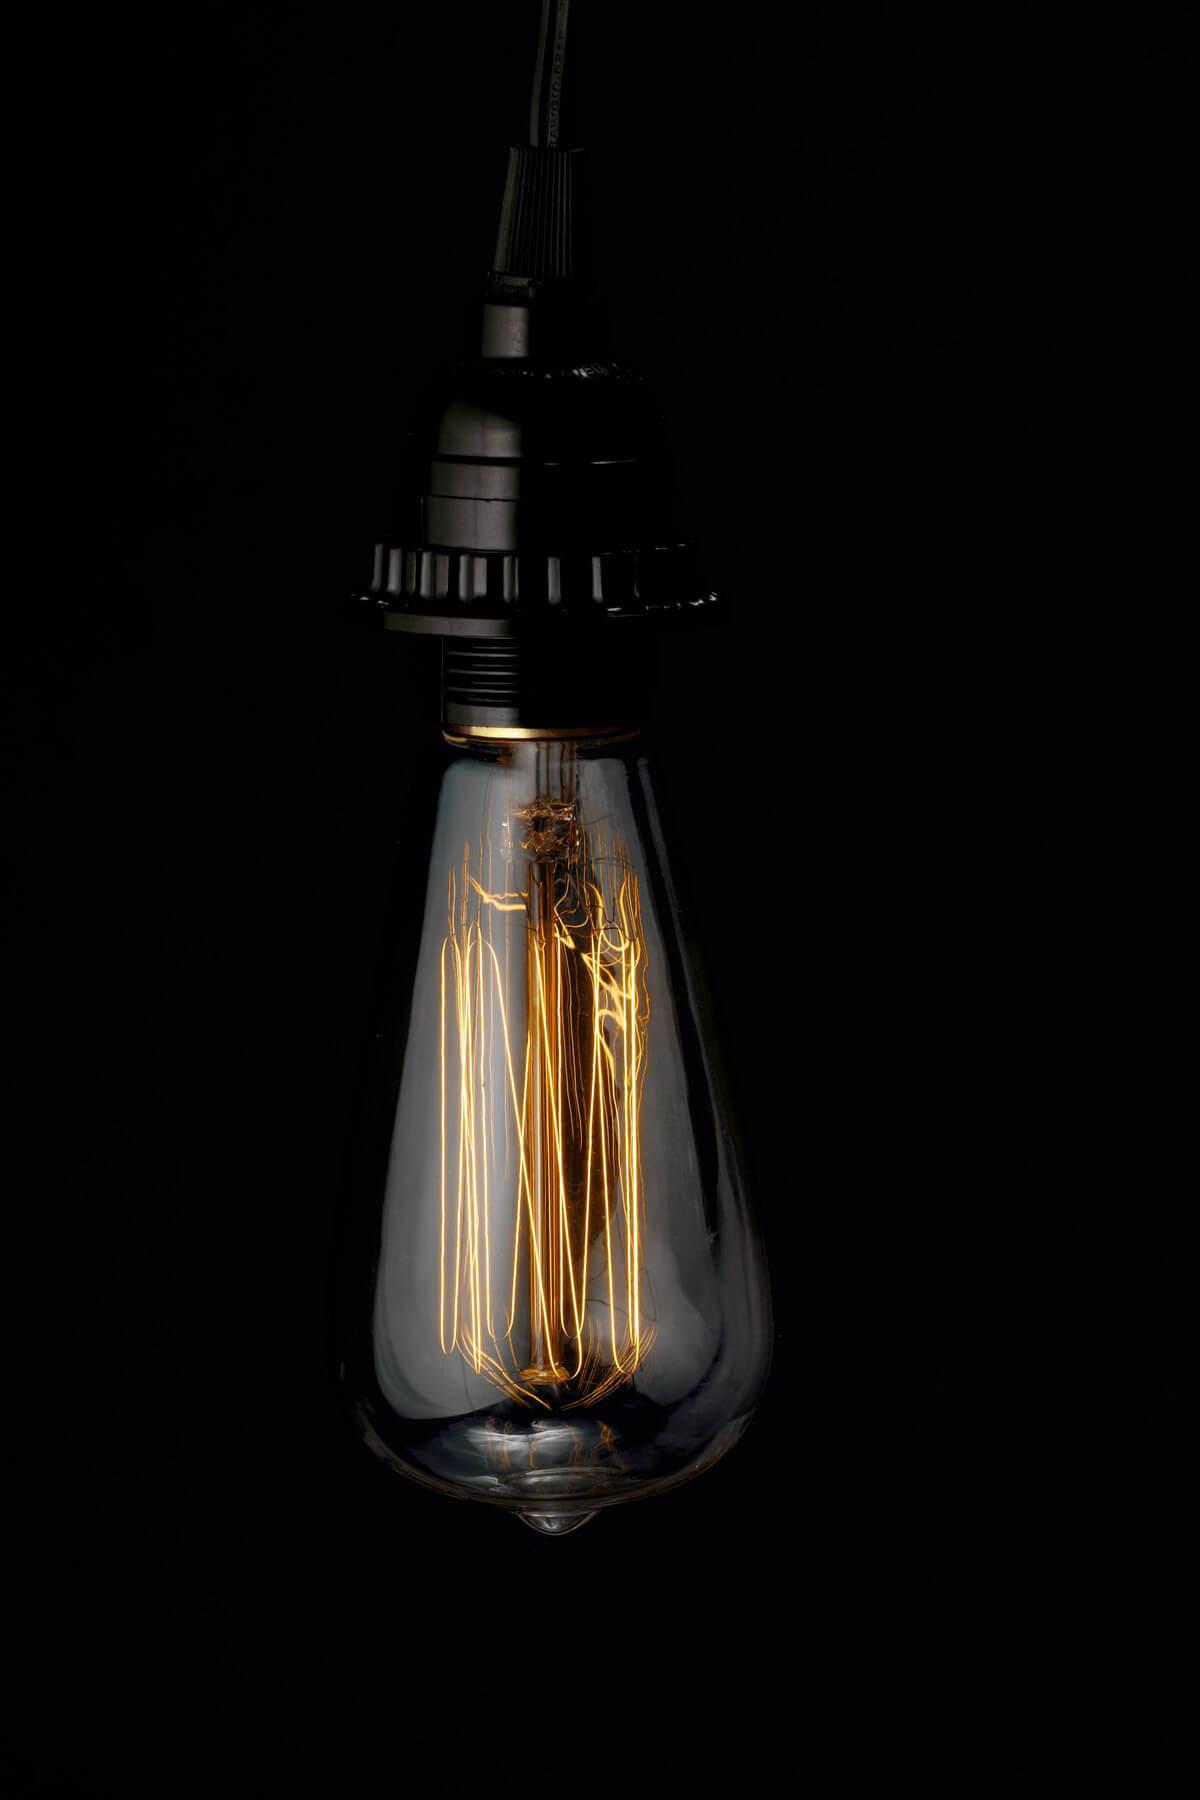 s20 edison light bulb 40w